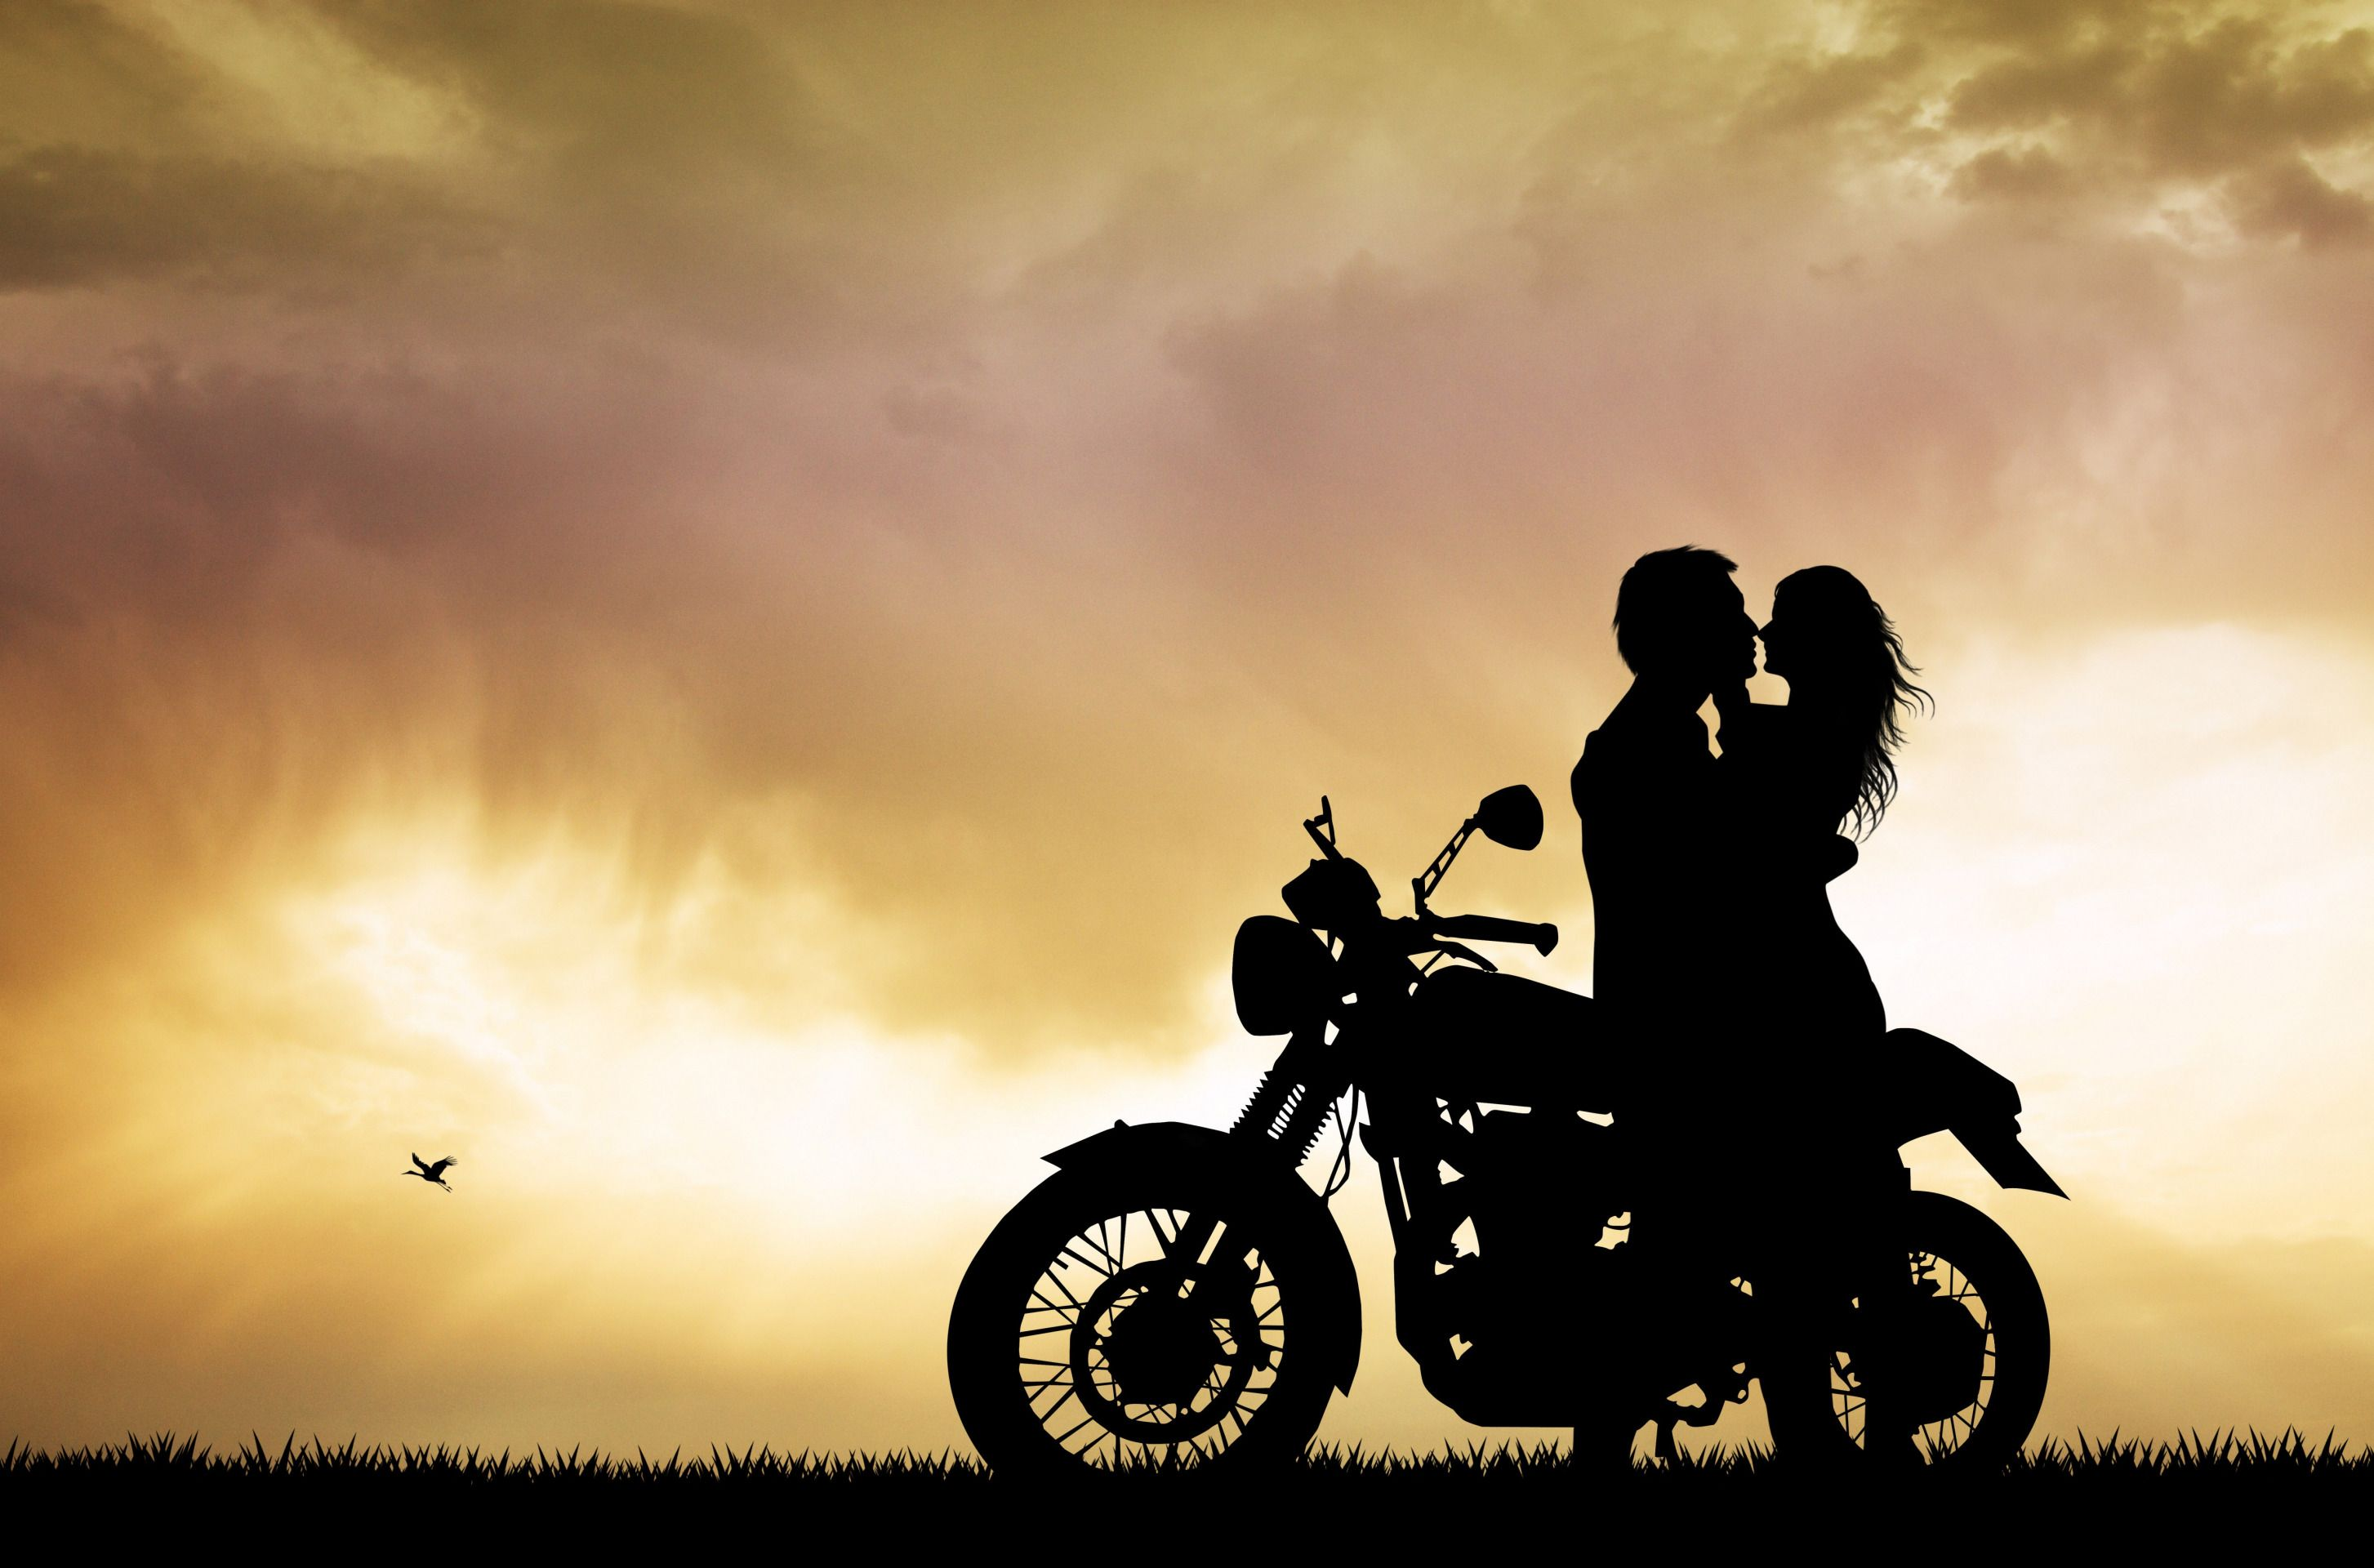 Download wallpaper summer, mood, romance, the evening